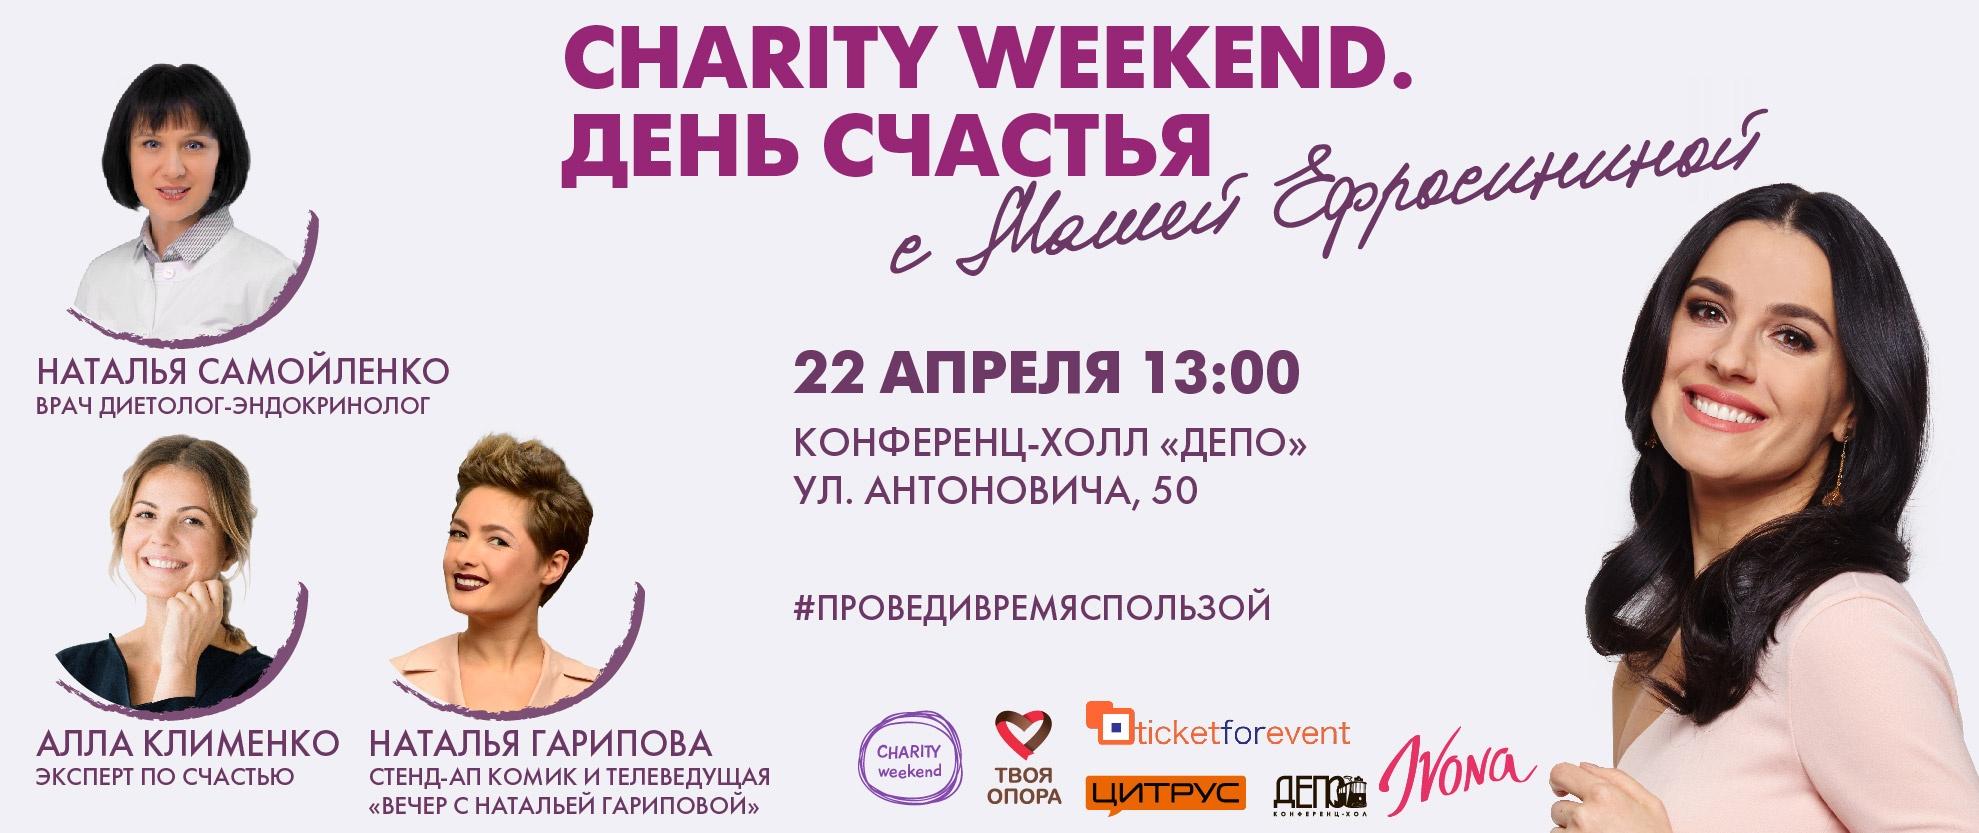 masha-efrosinina-priglashaet-na-charity-weekend-den-schastya